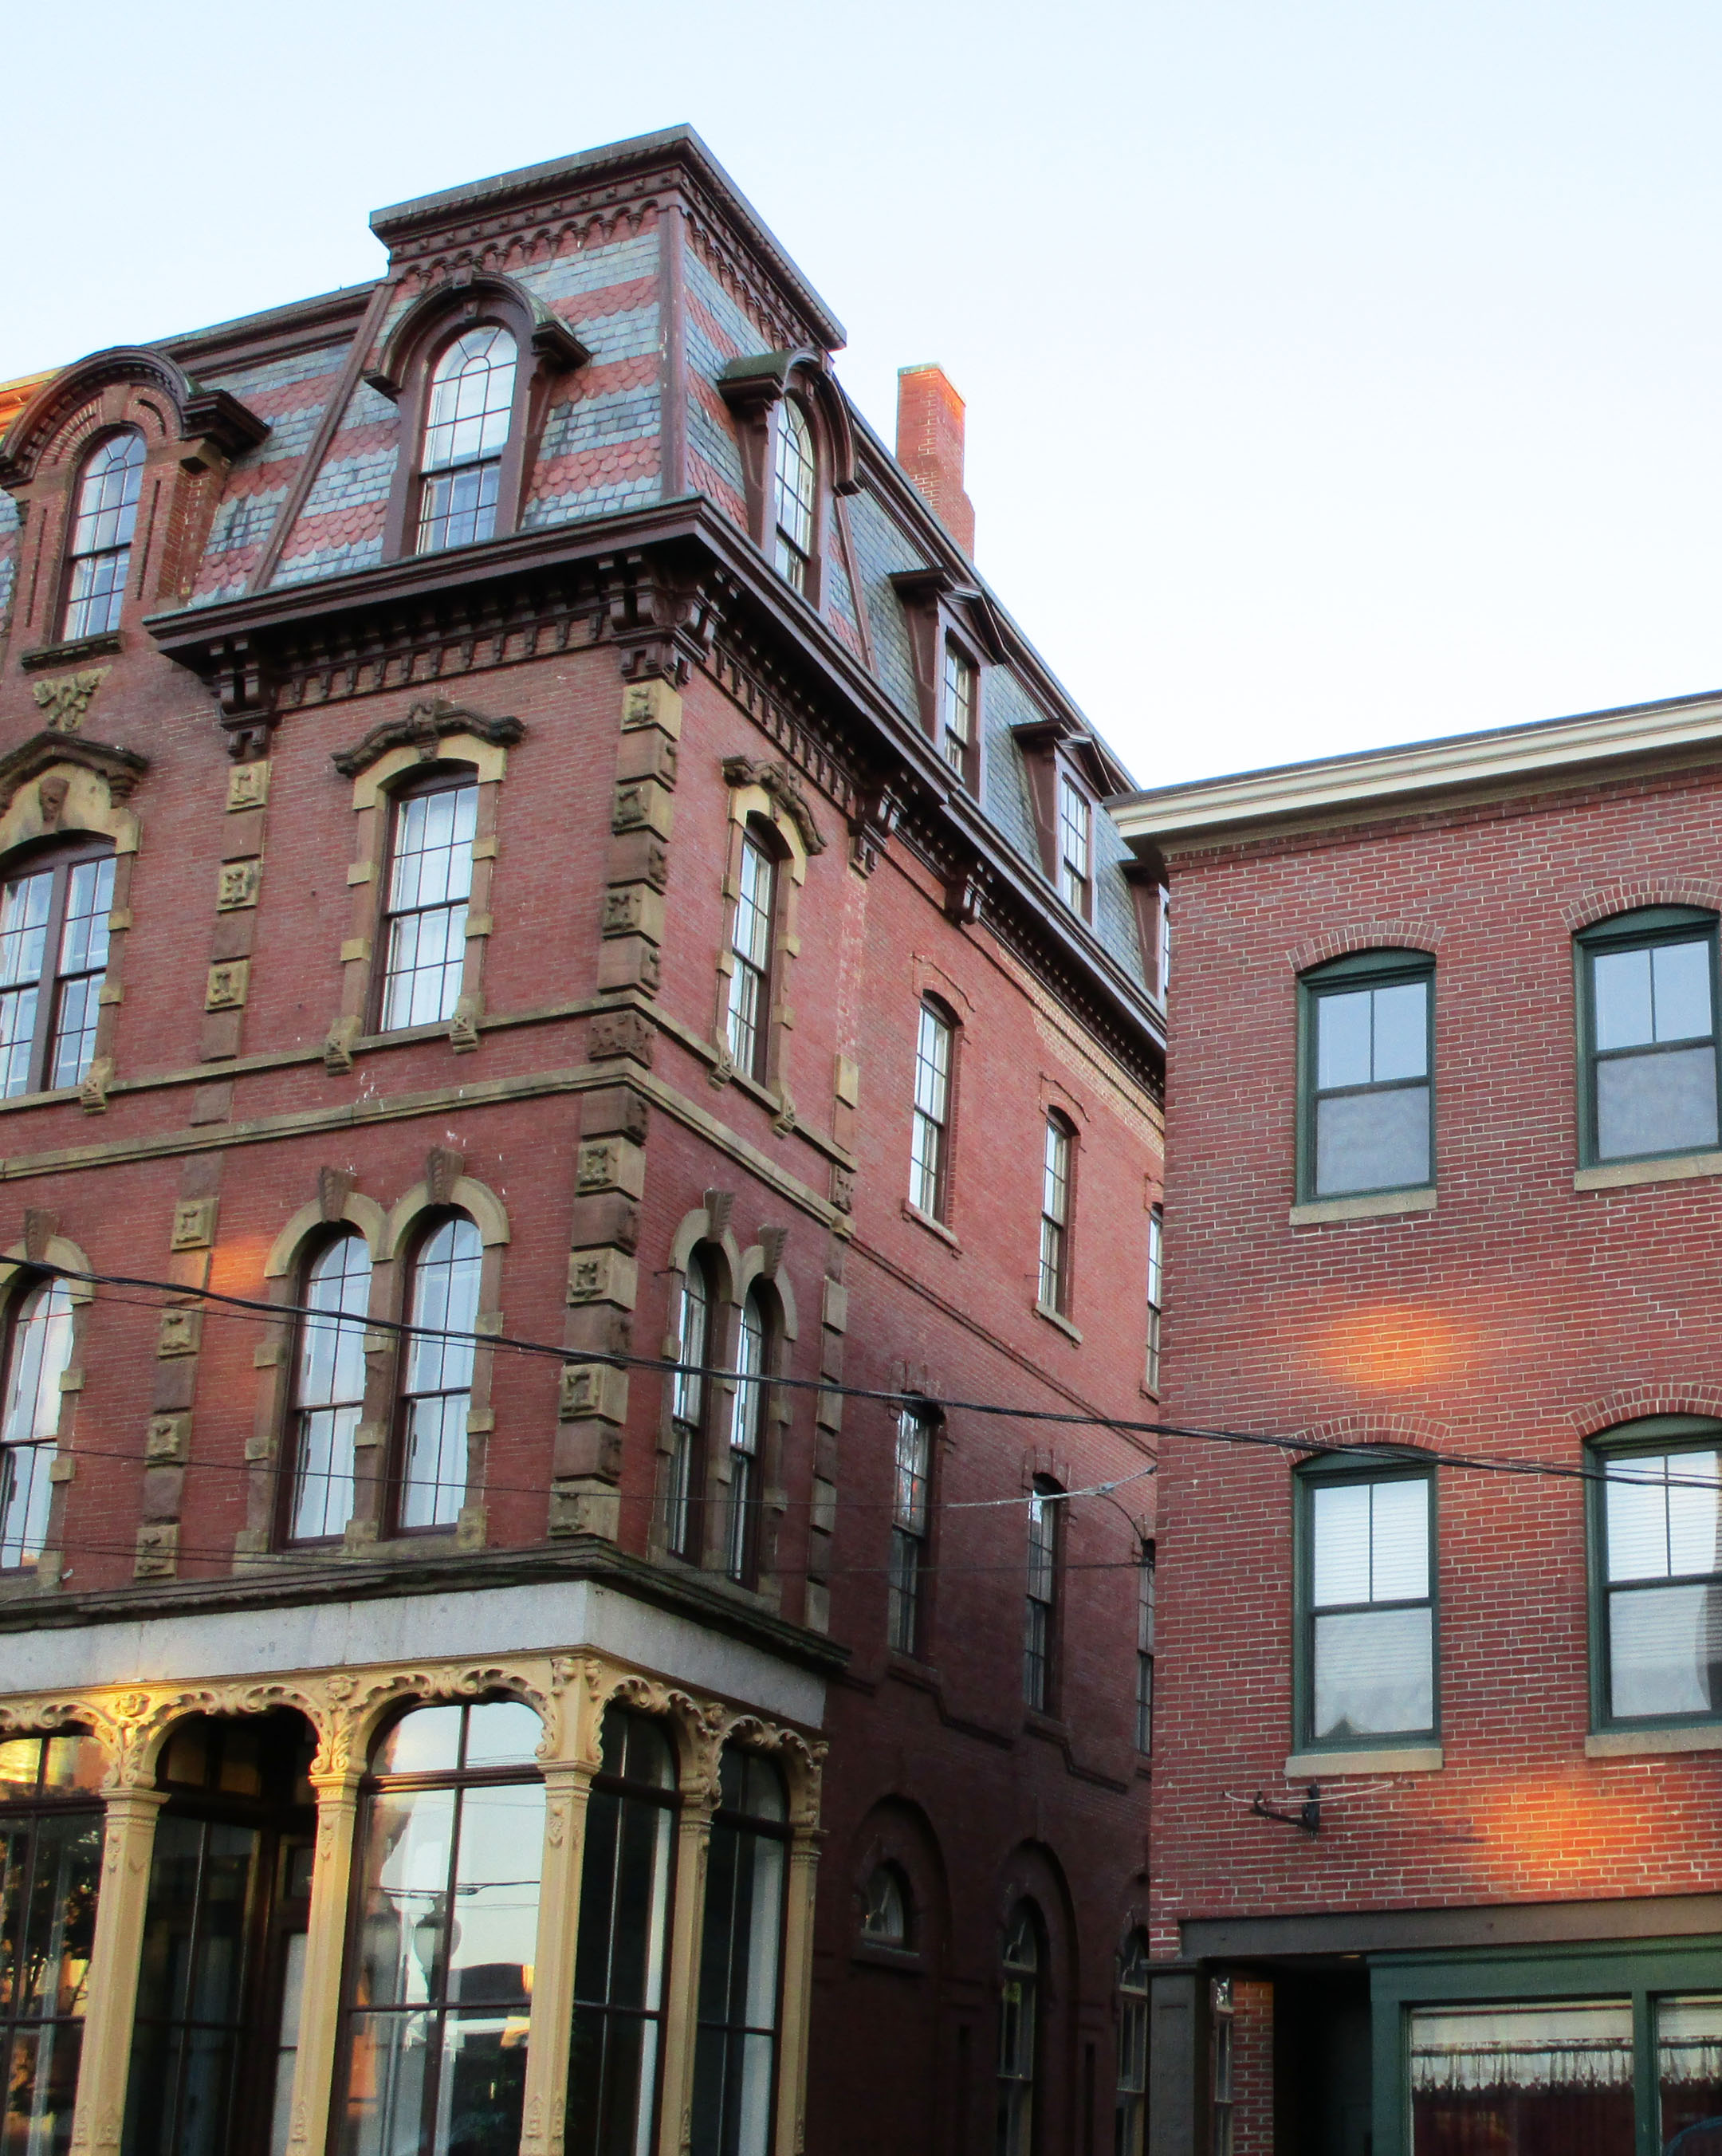 Brick Buildings Need Roof Overhangs | GreenBuildingAdvisor.com